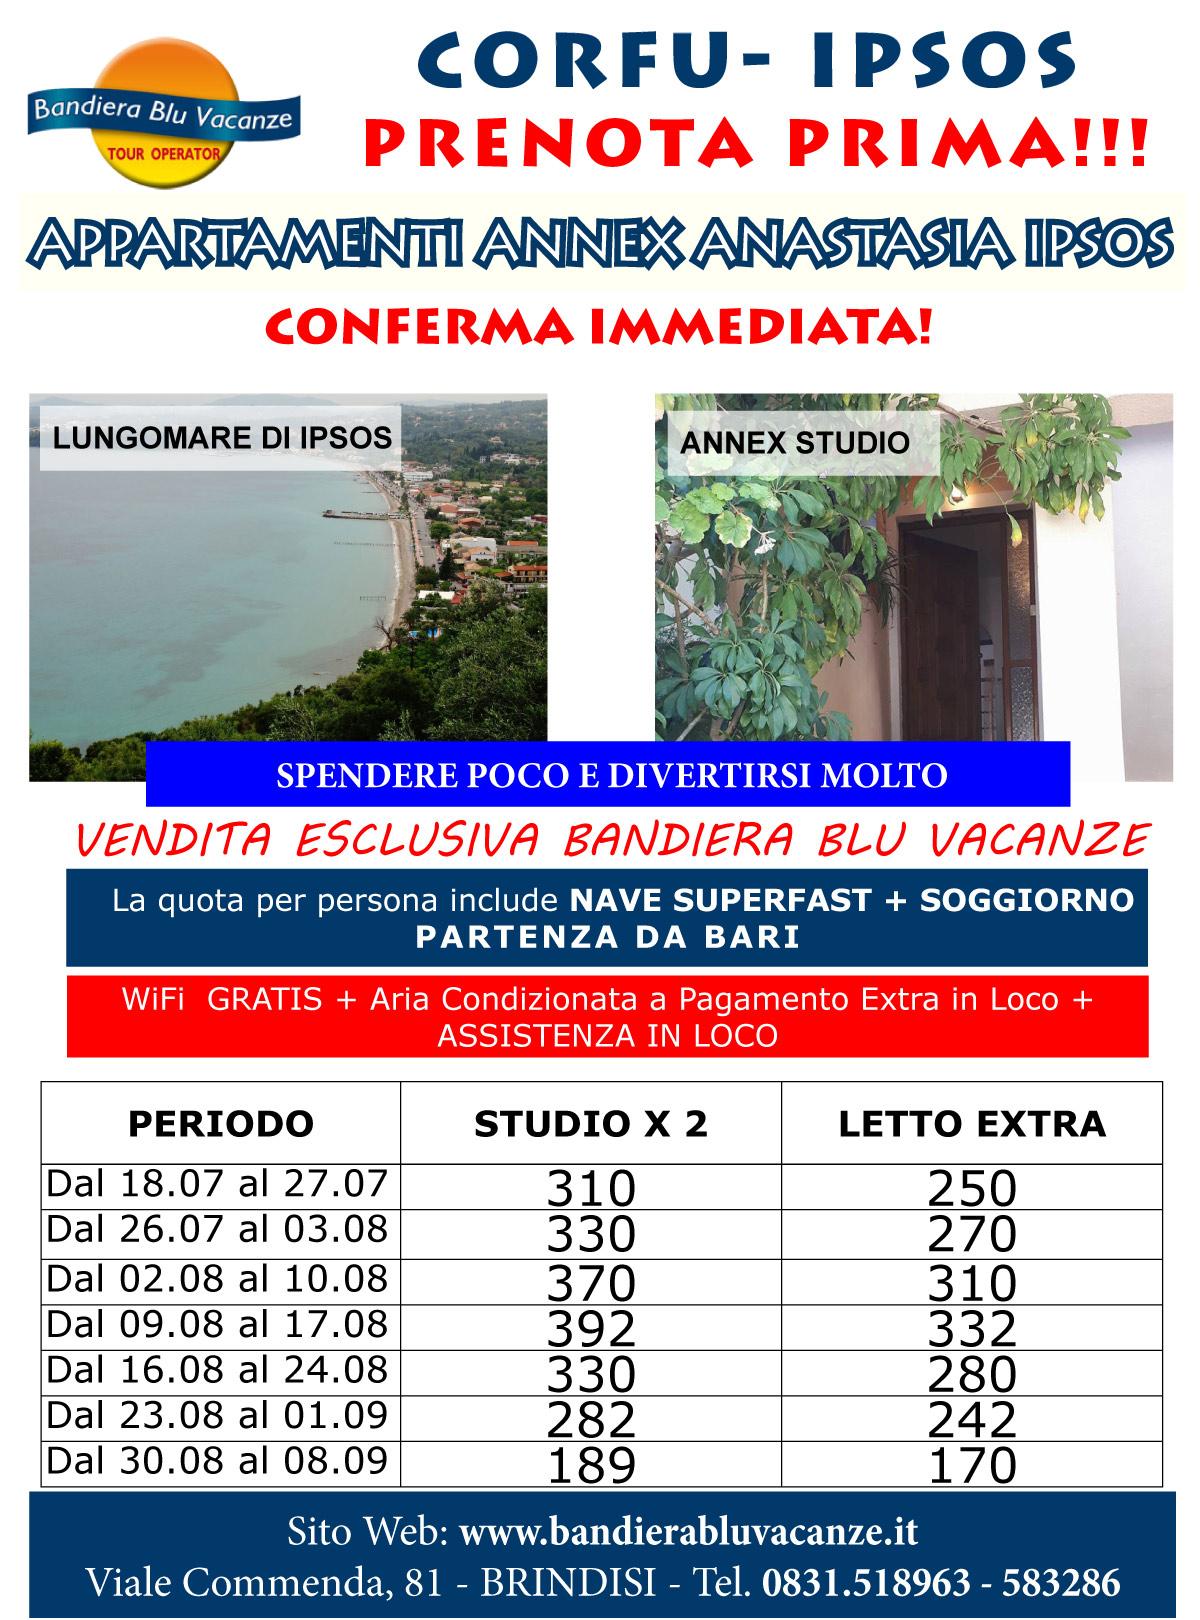 Offerta Annex Anastasia